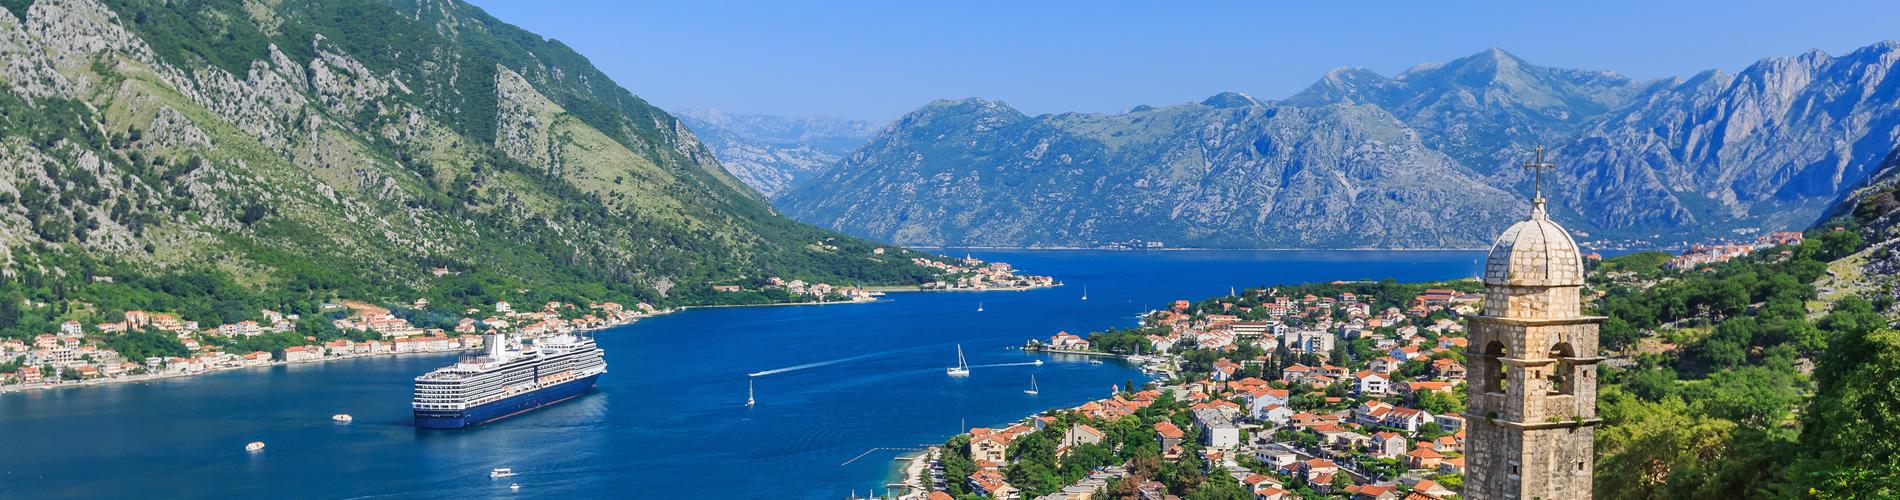 Montenegro Holidays Specialists